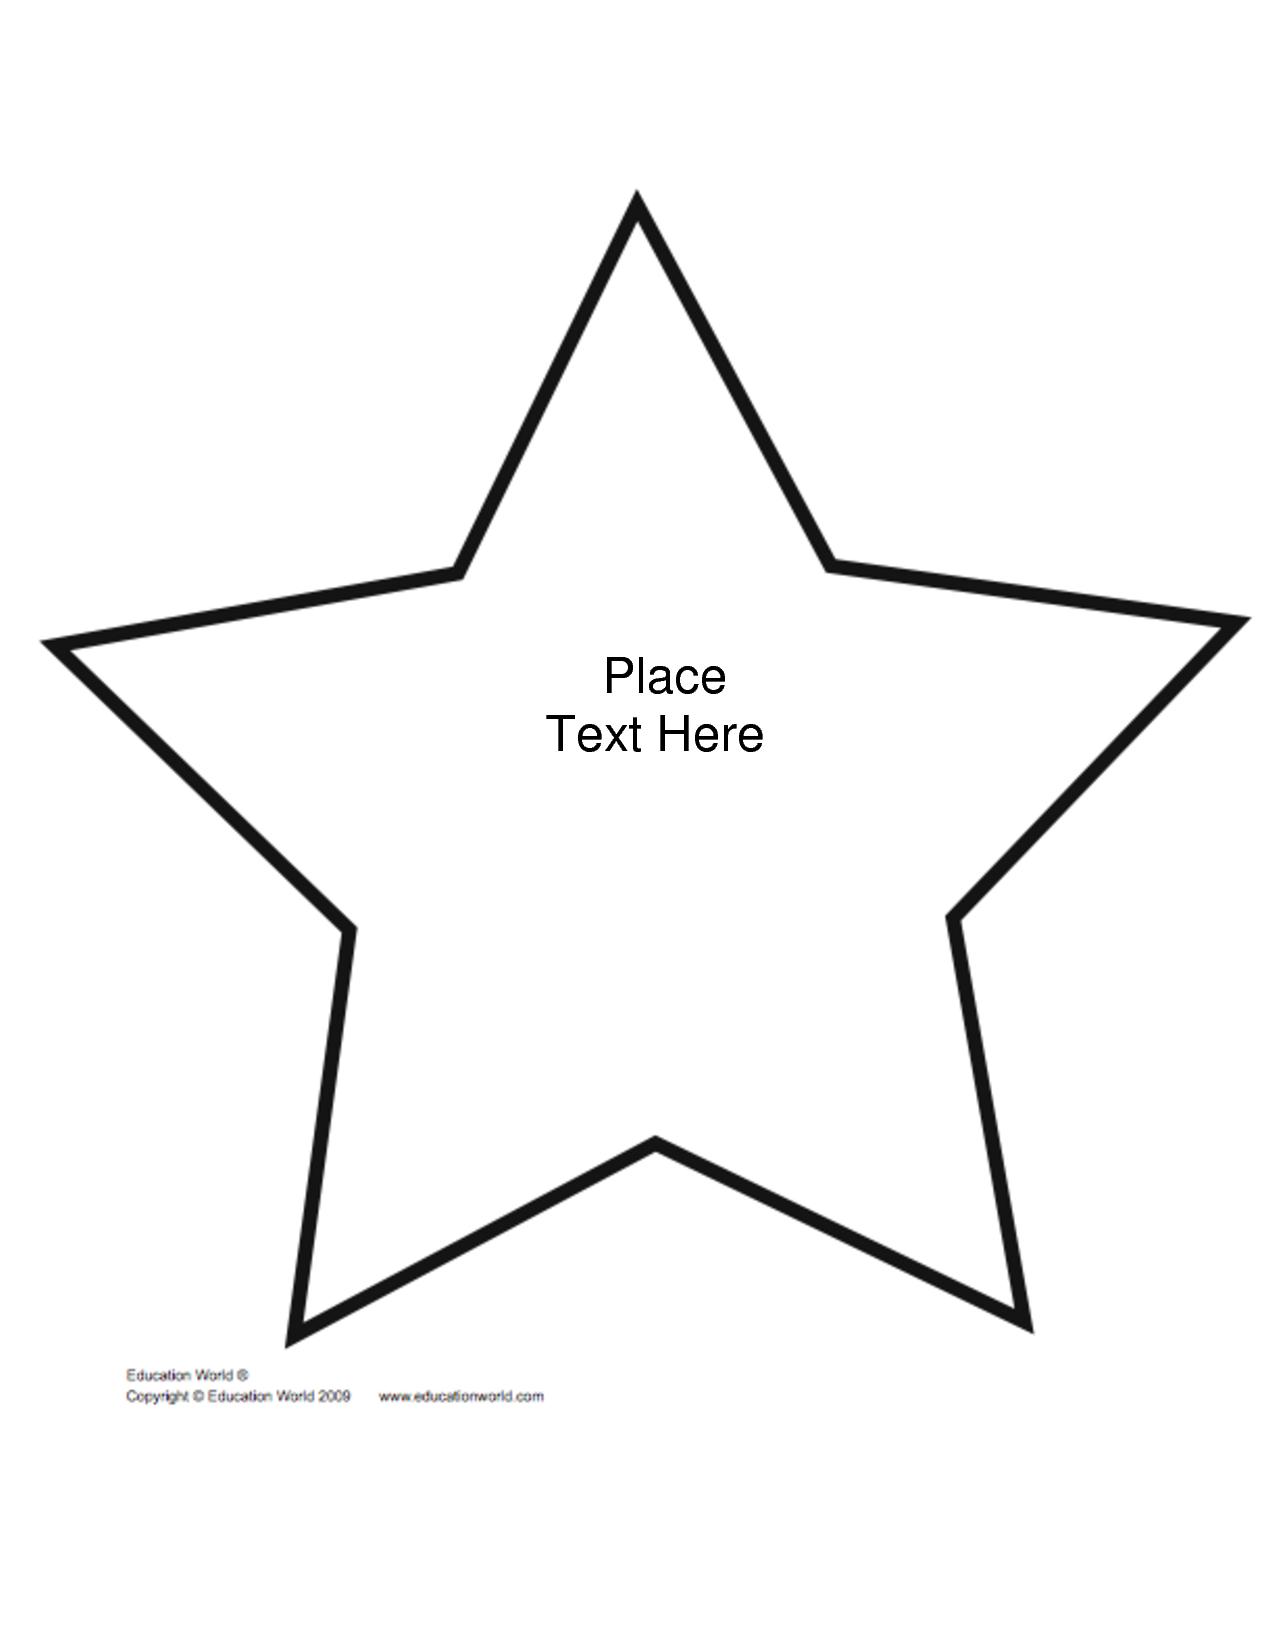 Free+Printable+Star+Shape+Templates   Biblical Preschool Lessons - Free Printable Shapes Templates